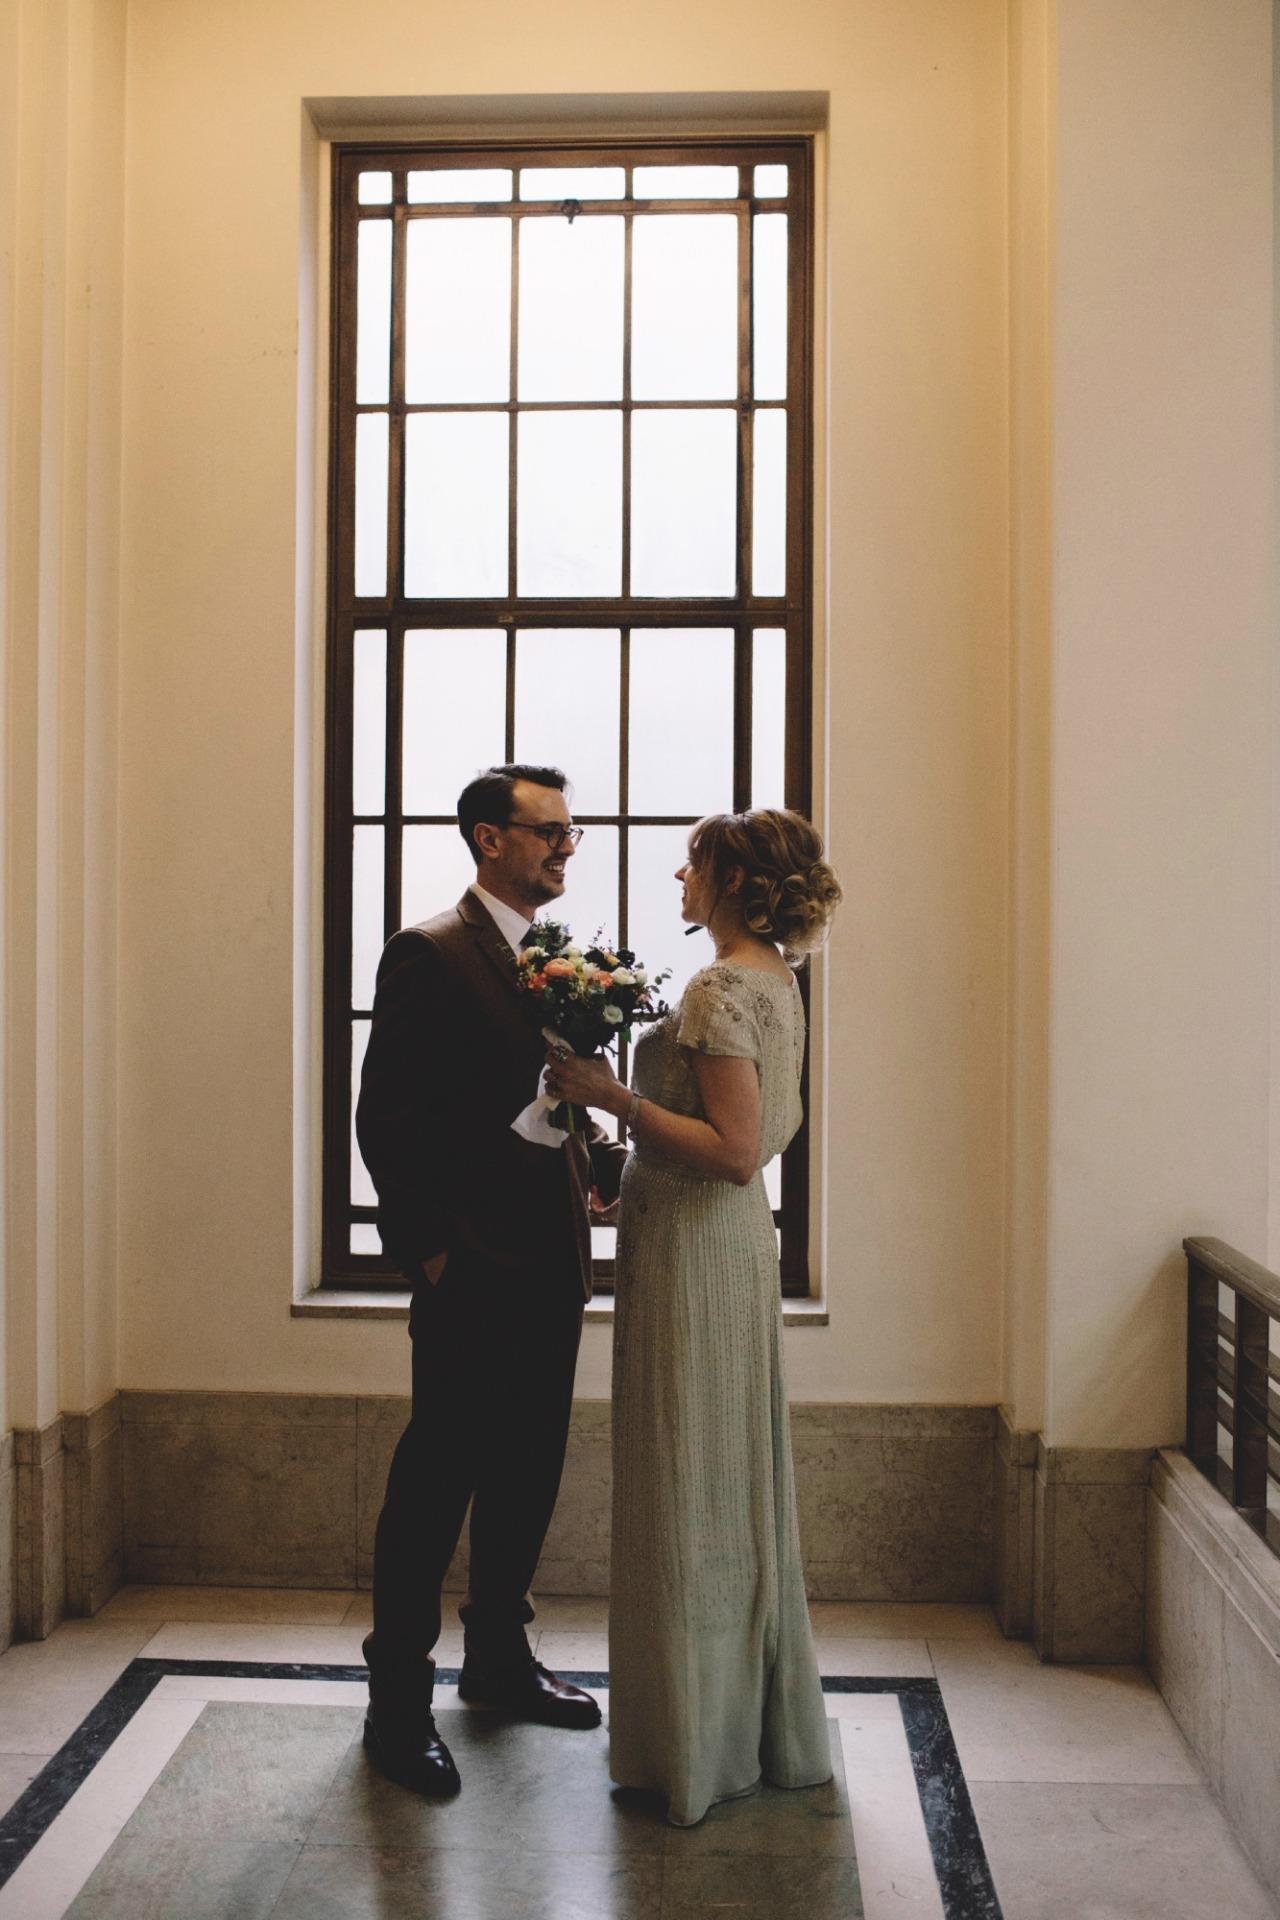 Green 1930s wedding dress